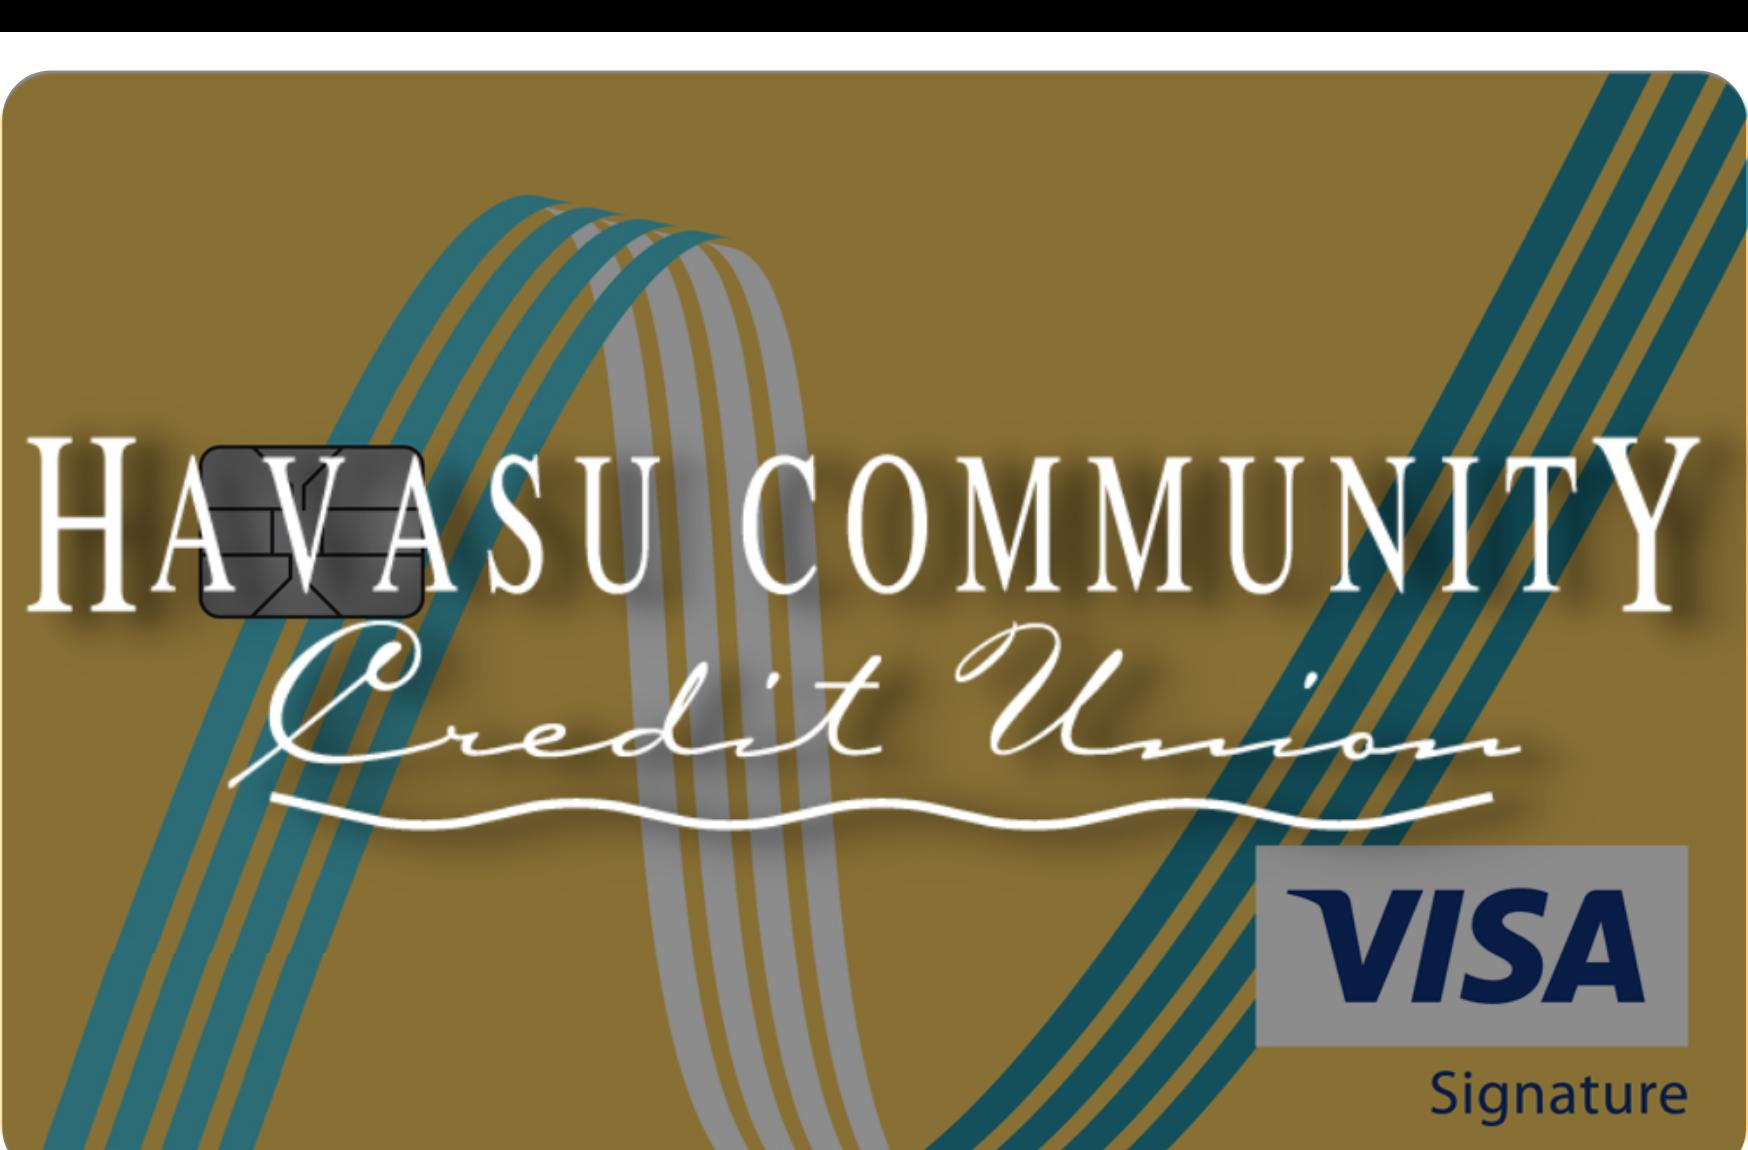 Havasu Community Credit Union Credit Card Brand